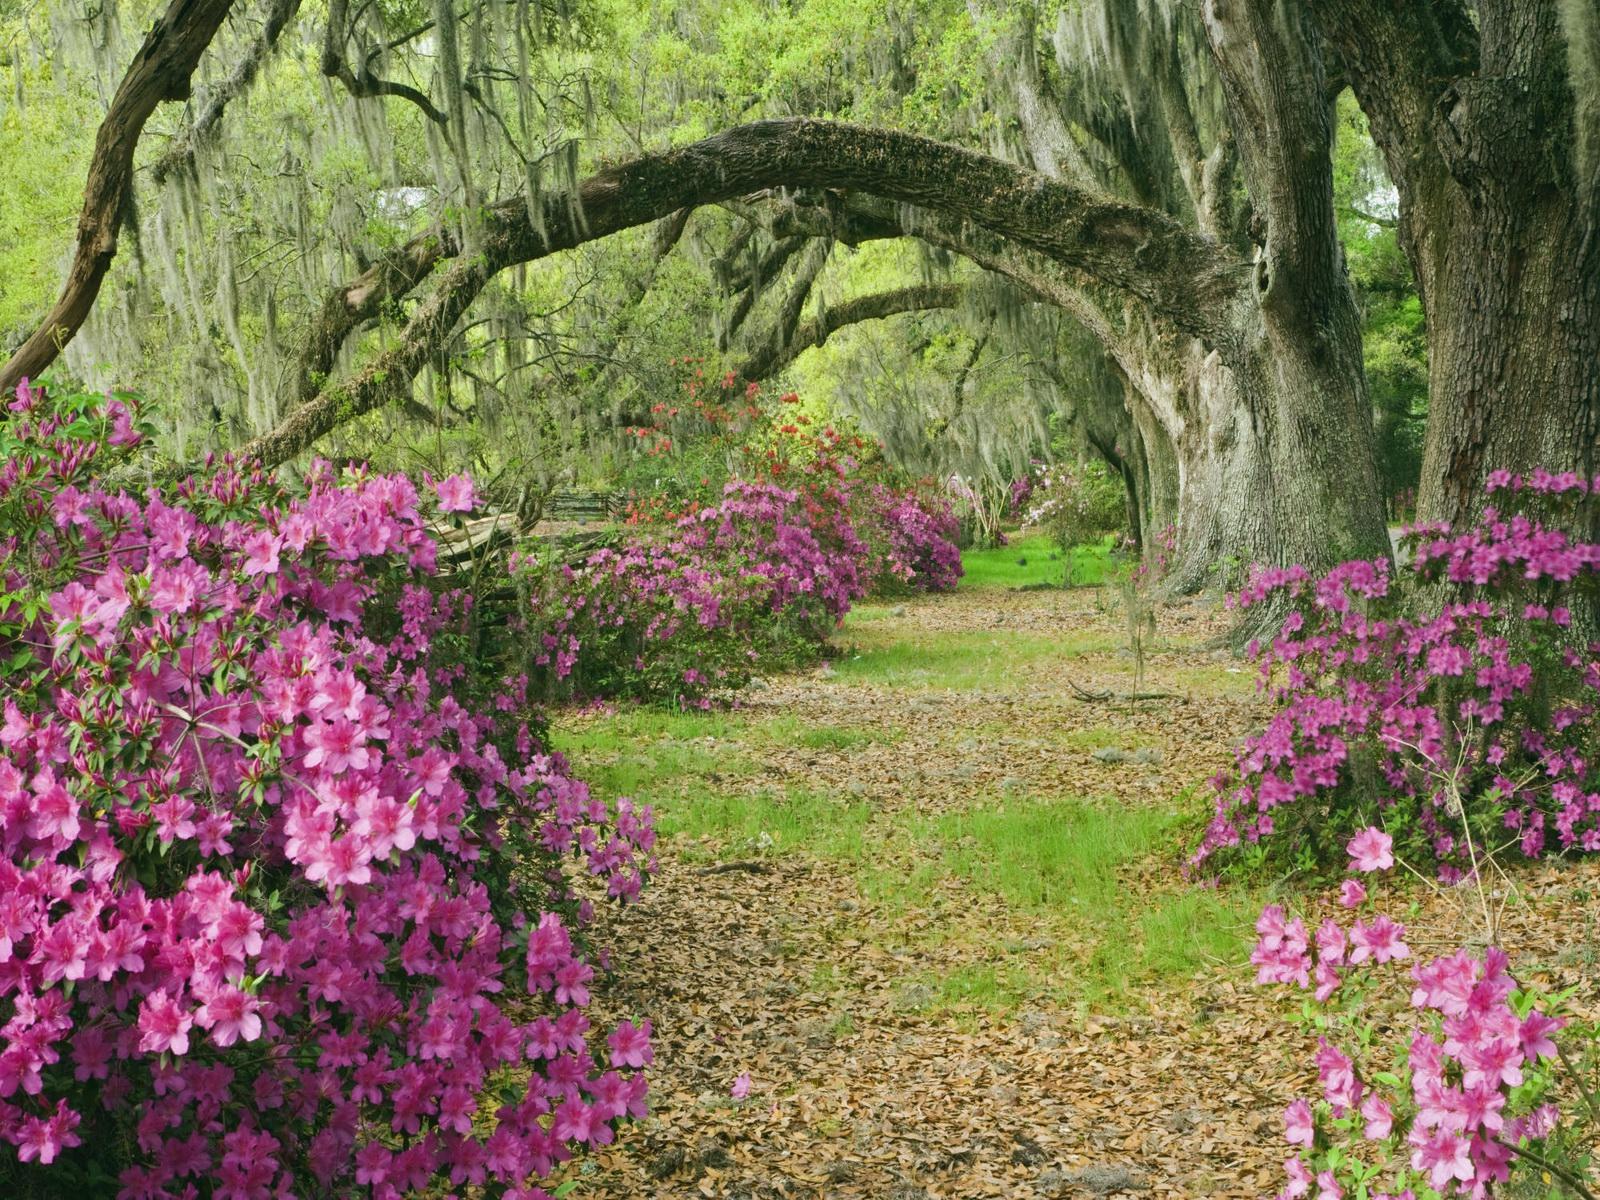 http://3.bp.blogspot.com/_wrjKYtPpnXU/TUfzcmm23OI/AAAAAAAAAtE/SUffF7FIjMs/s1600/Flower+Garden+FGAD.jpg